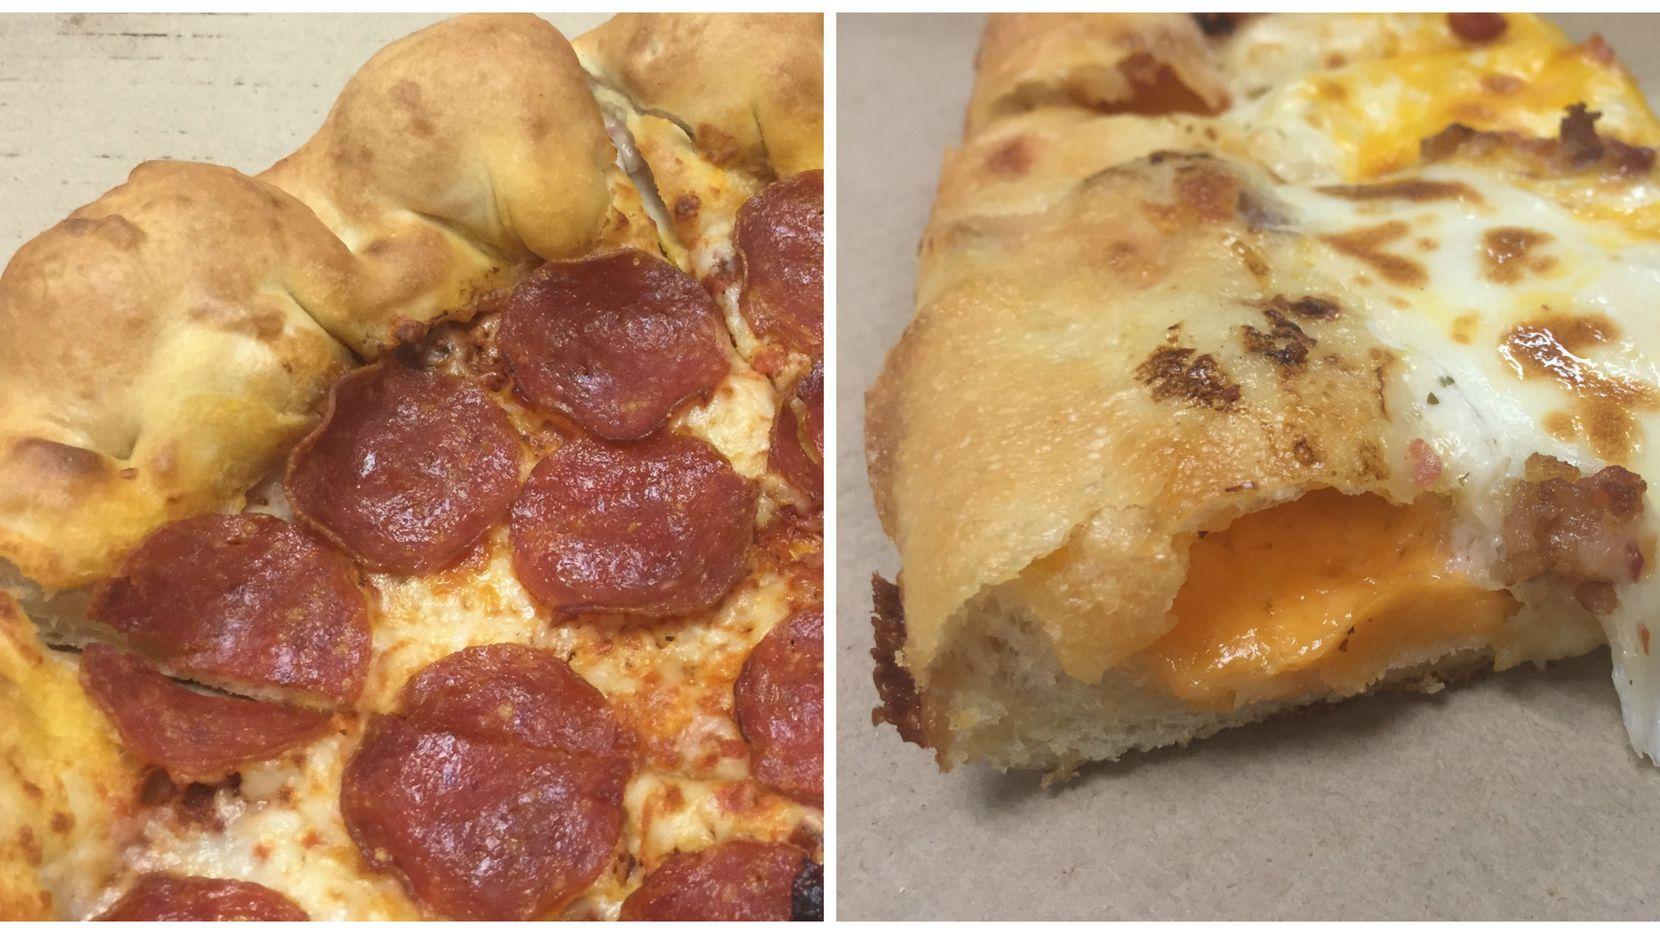 Pizza Hut's stuffed-crust pizza, on left, was compared to Cicis stuffed-crust pizza, on the right.